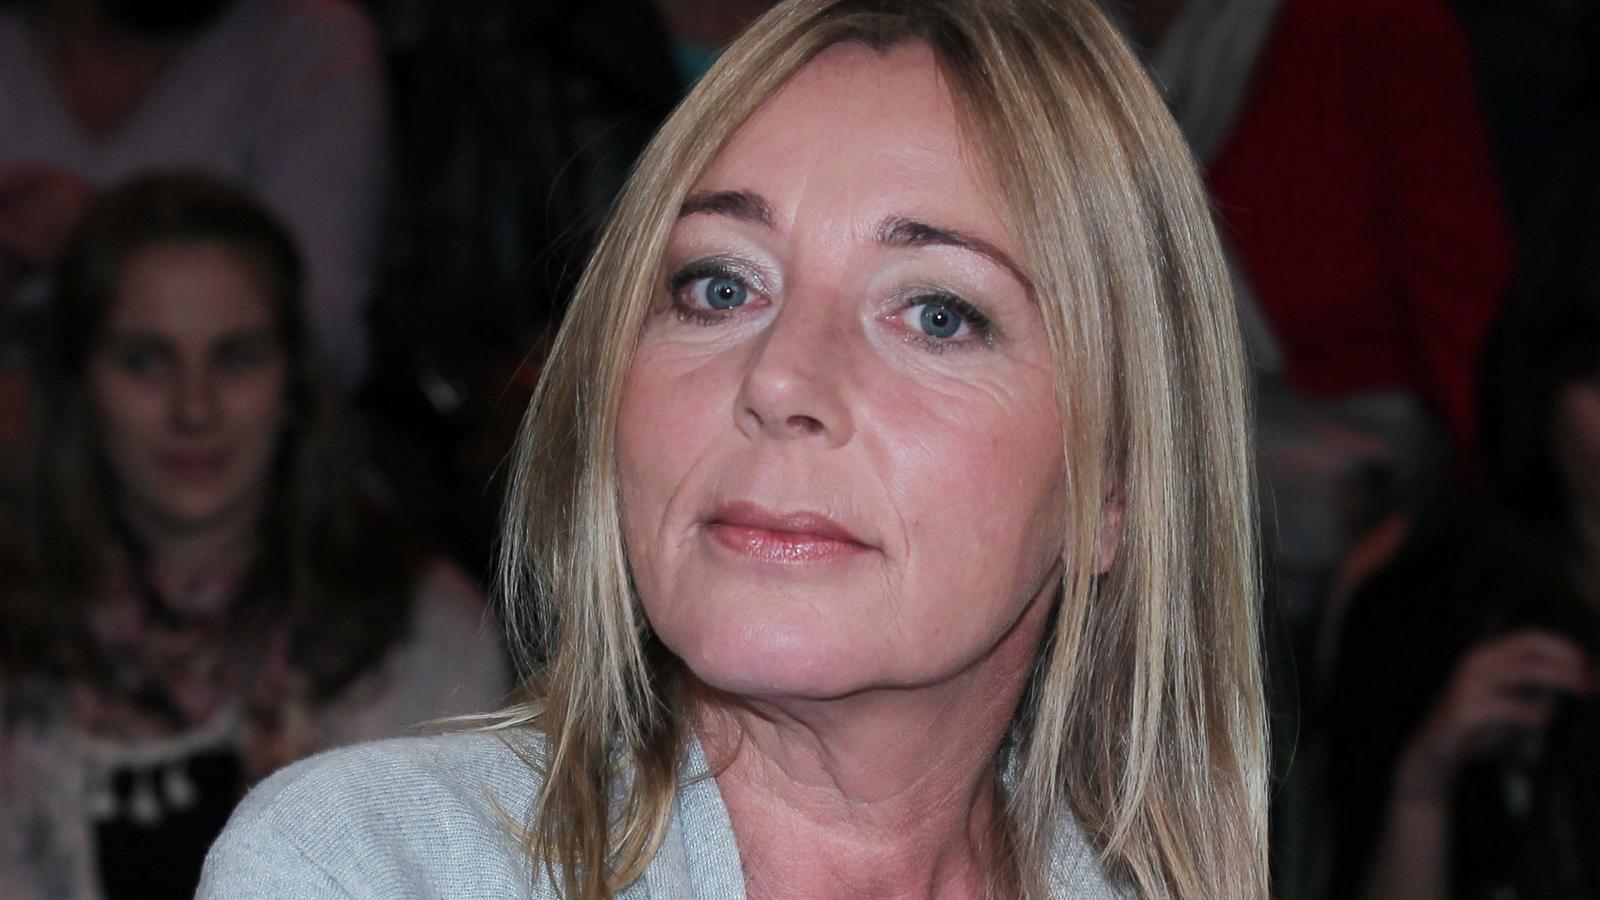 Susanne Preusker begeht Selbstmord: Familie trauert um